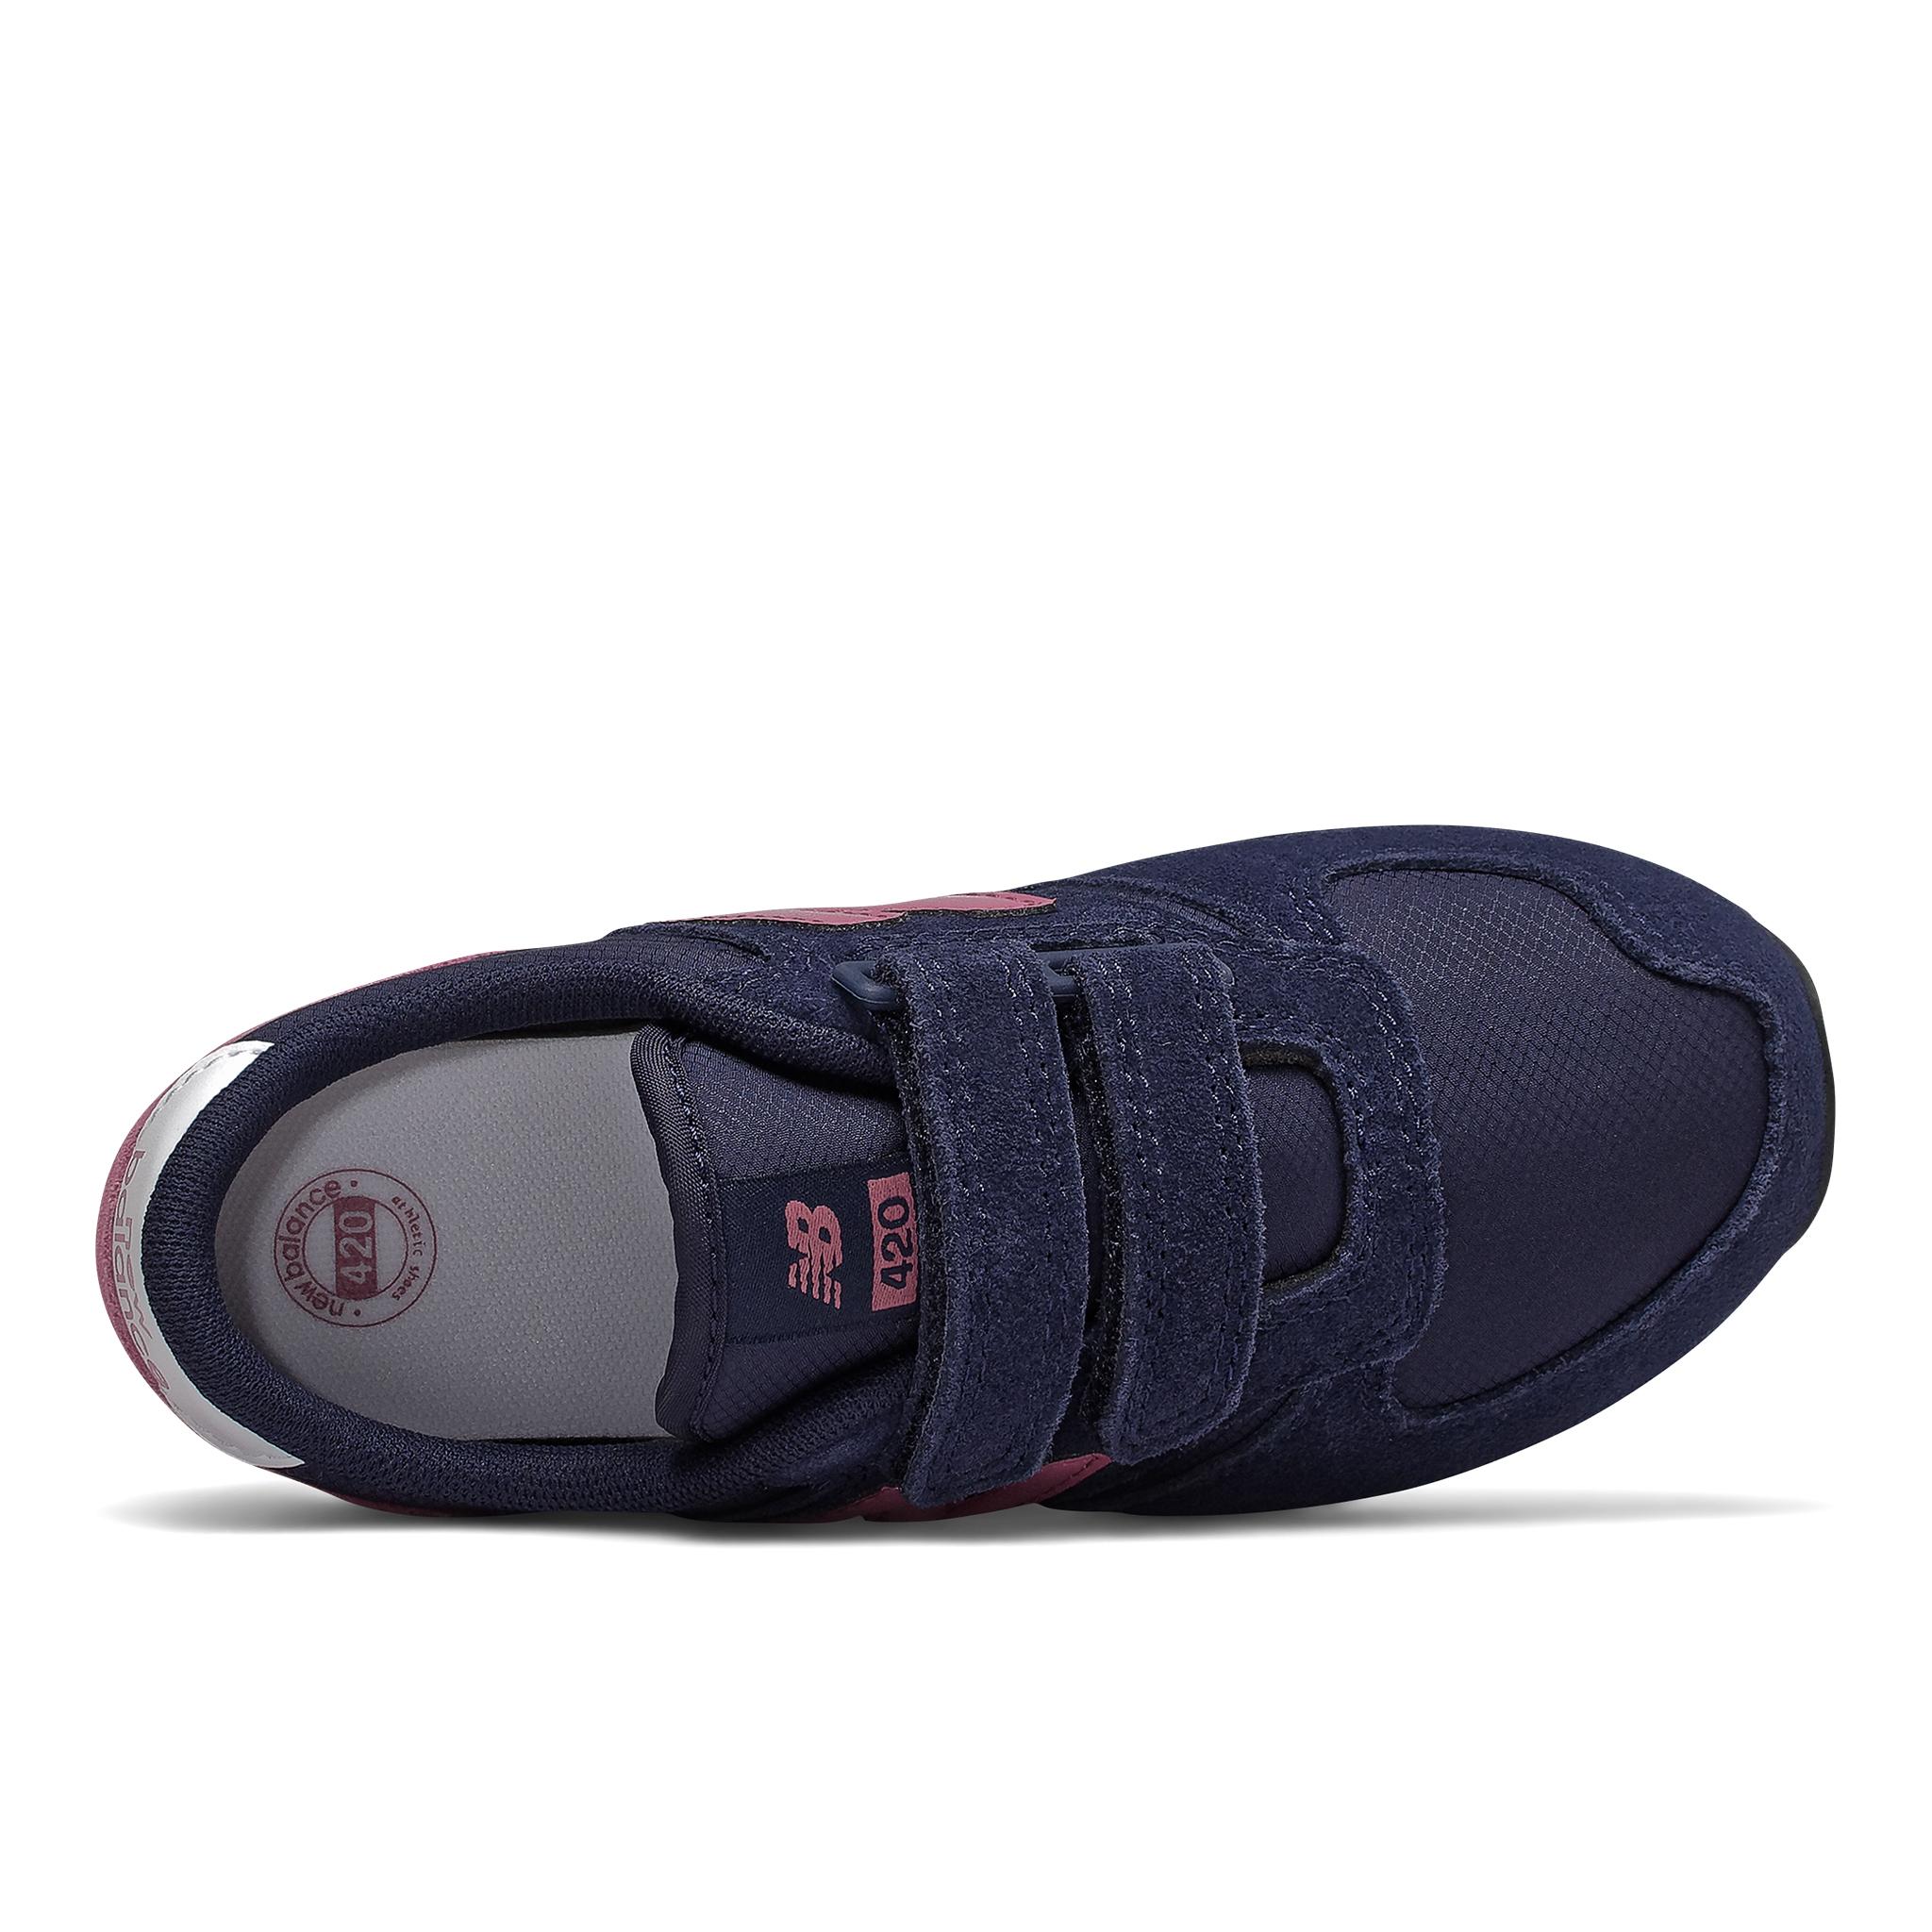 New Balance 420 sneakers, pigment, 33